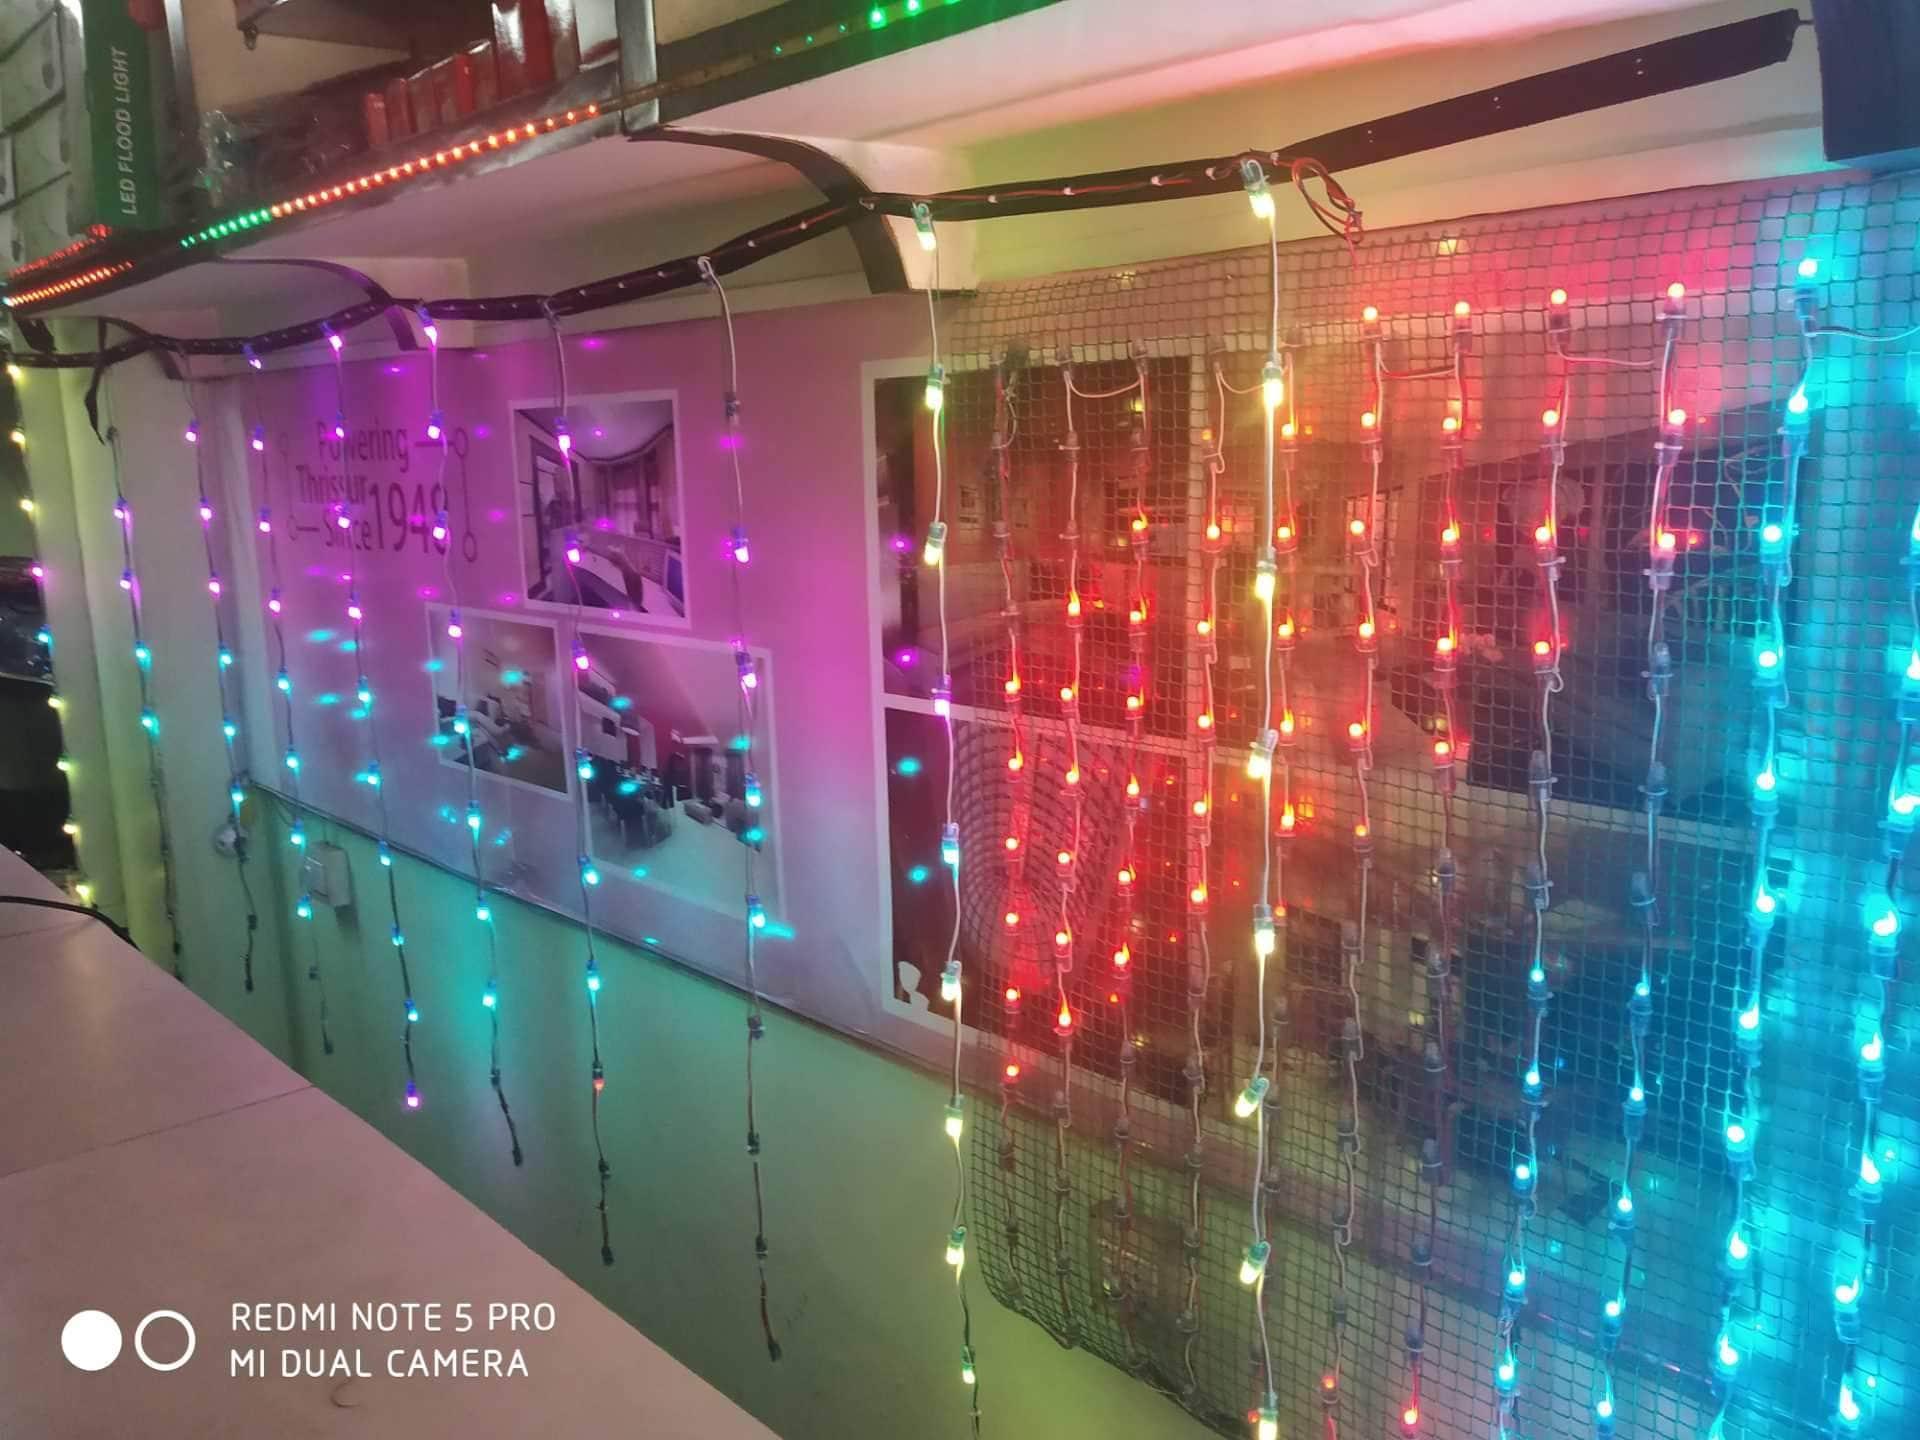 ooit populair geweldige aanbiedingen 2017 discountwinkel A P K Led Galaxy, Thrissur HO - LED Dealers in Thrissur ...